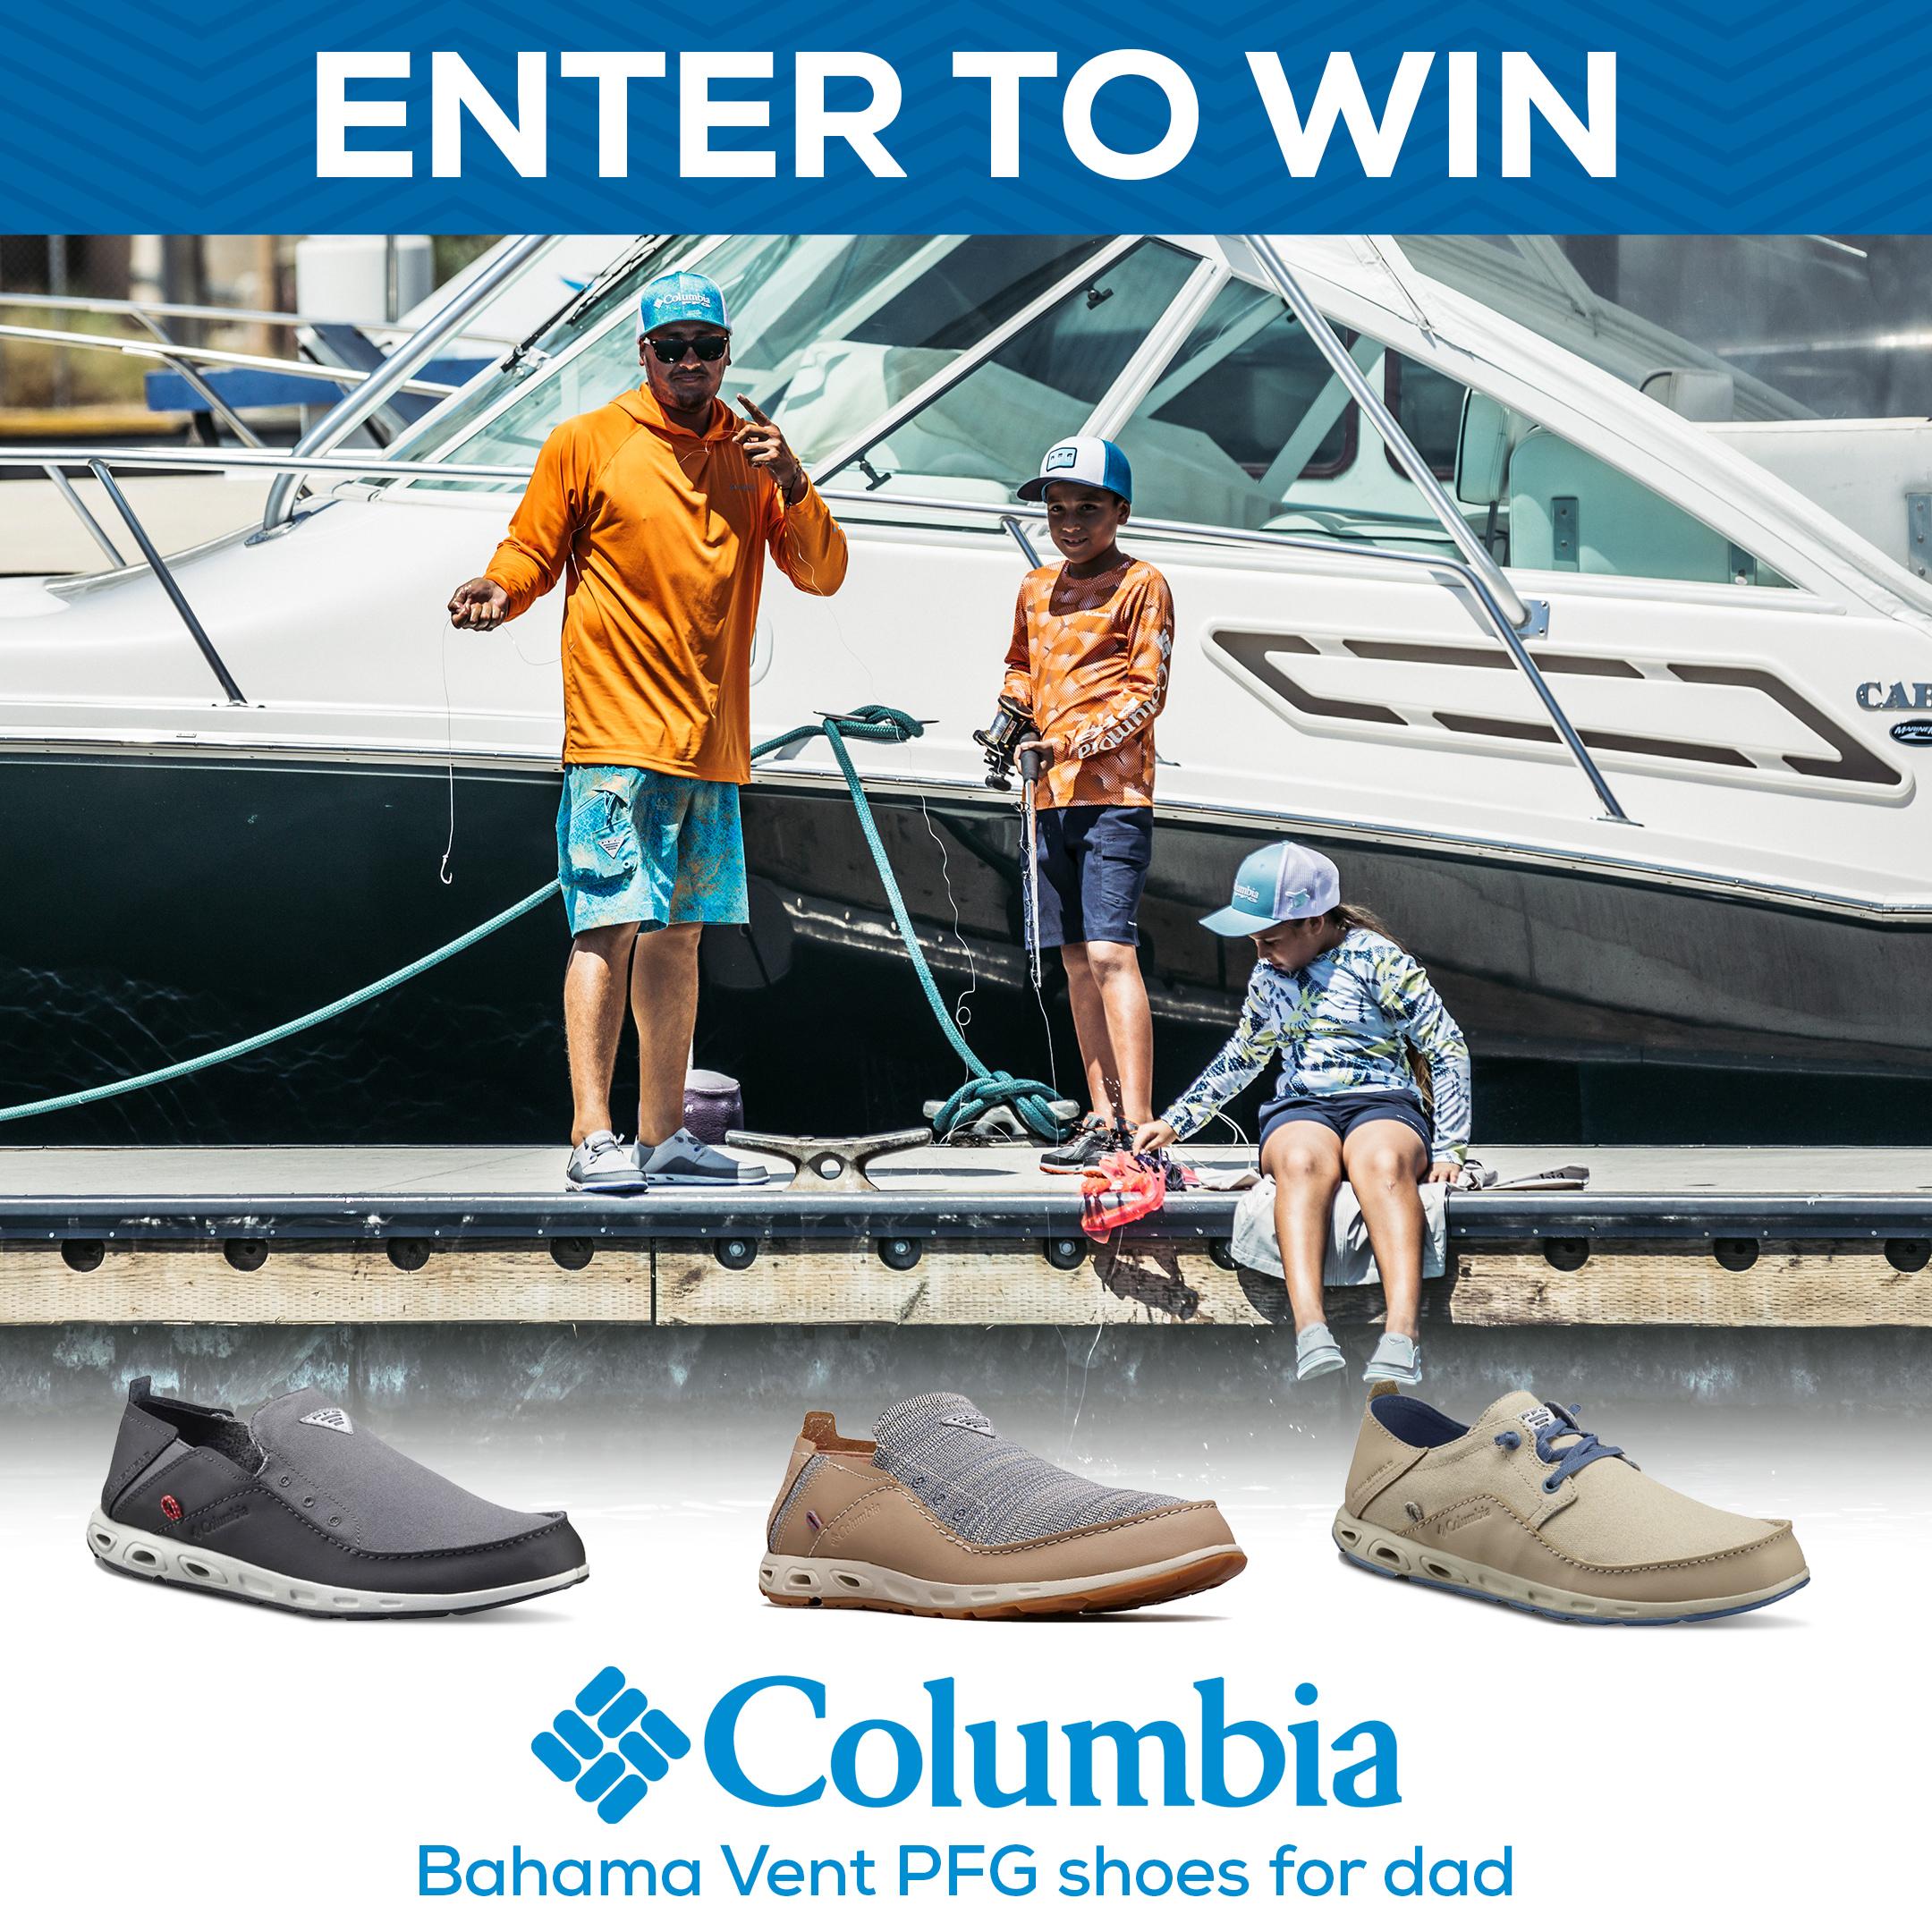 Win Columbia Bahama Vent PFG Shoes